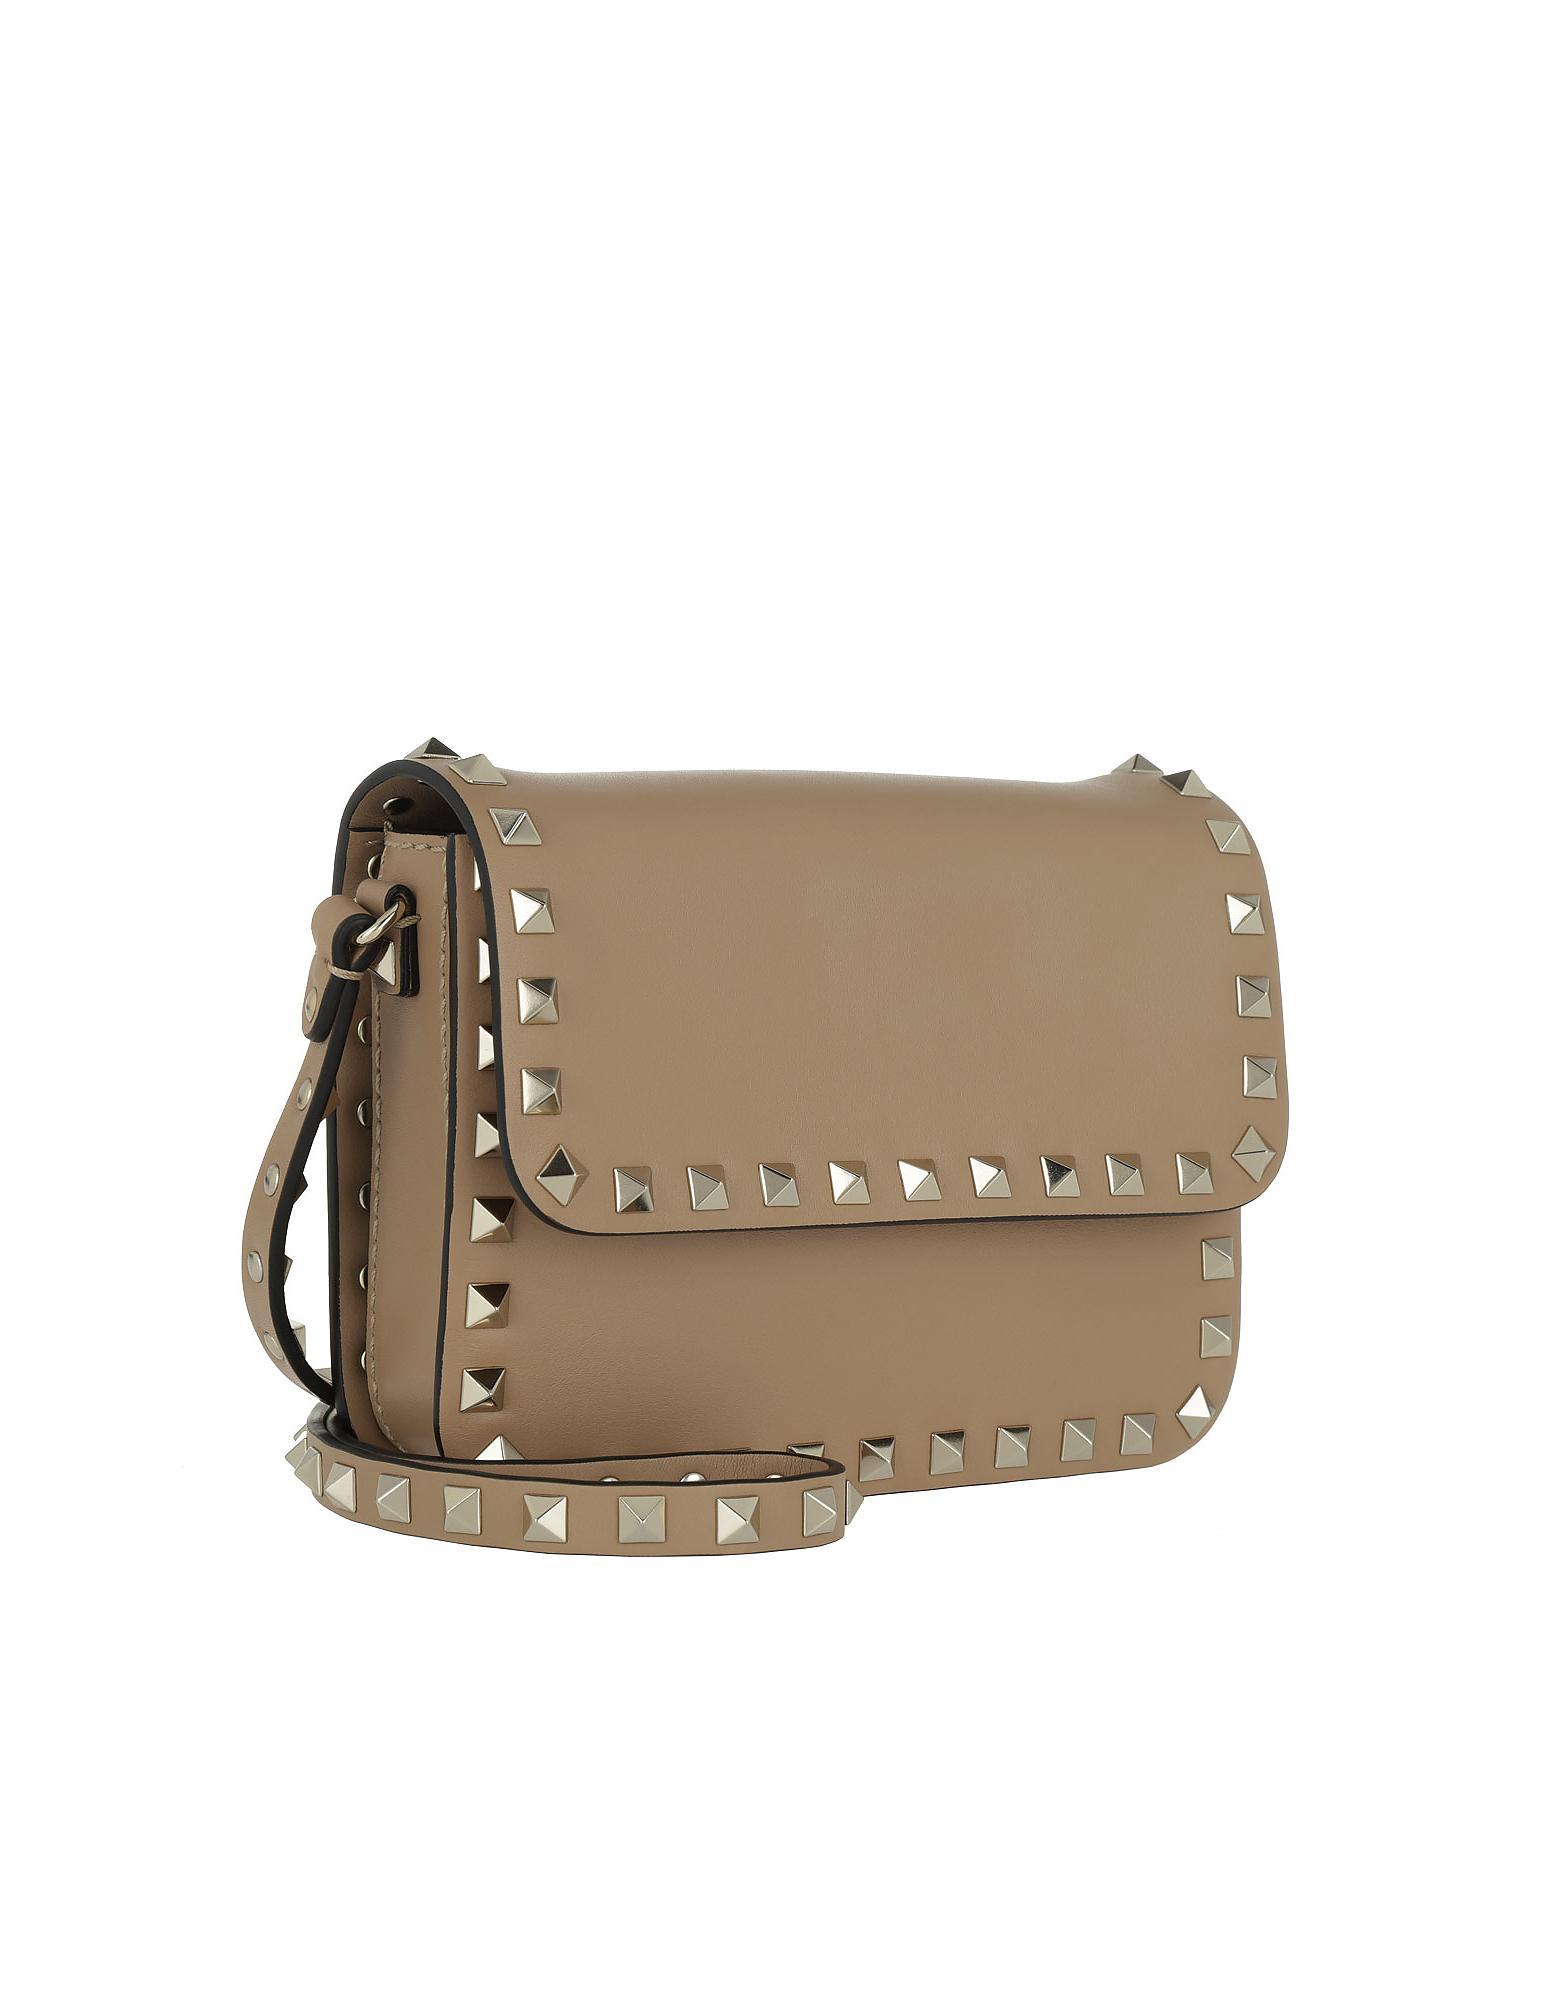 cf01562c0e9 Lyst - Valentino Rockstud Shoulder Bag Cammello in Natural